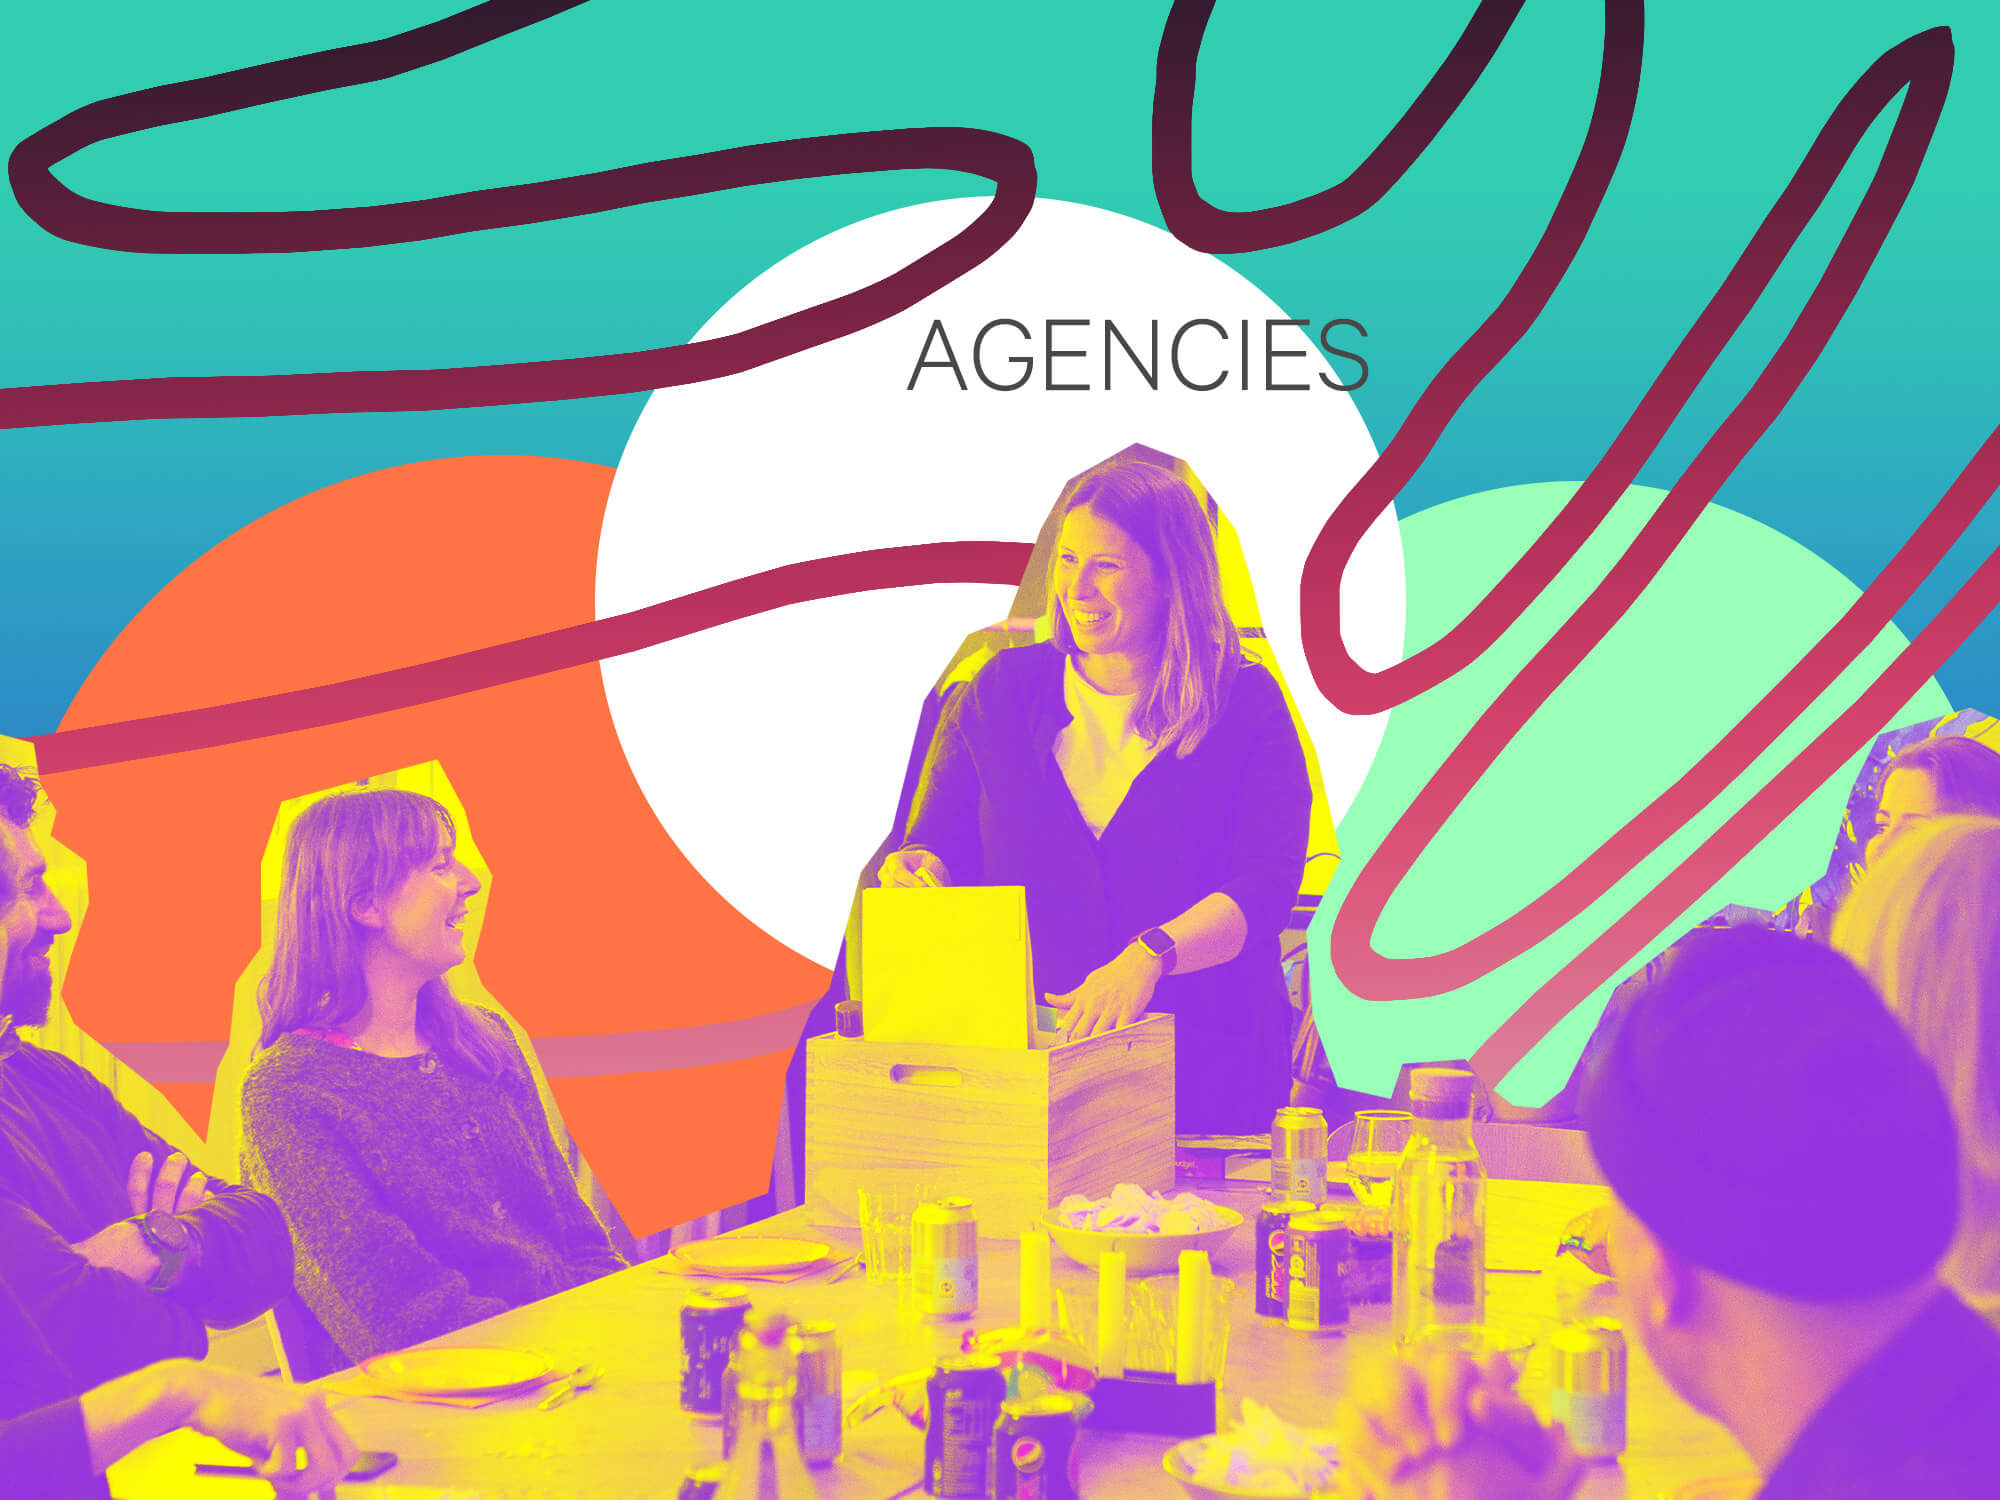 Get More Freelance Clients Using Social Media - Creative Agencies